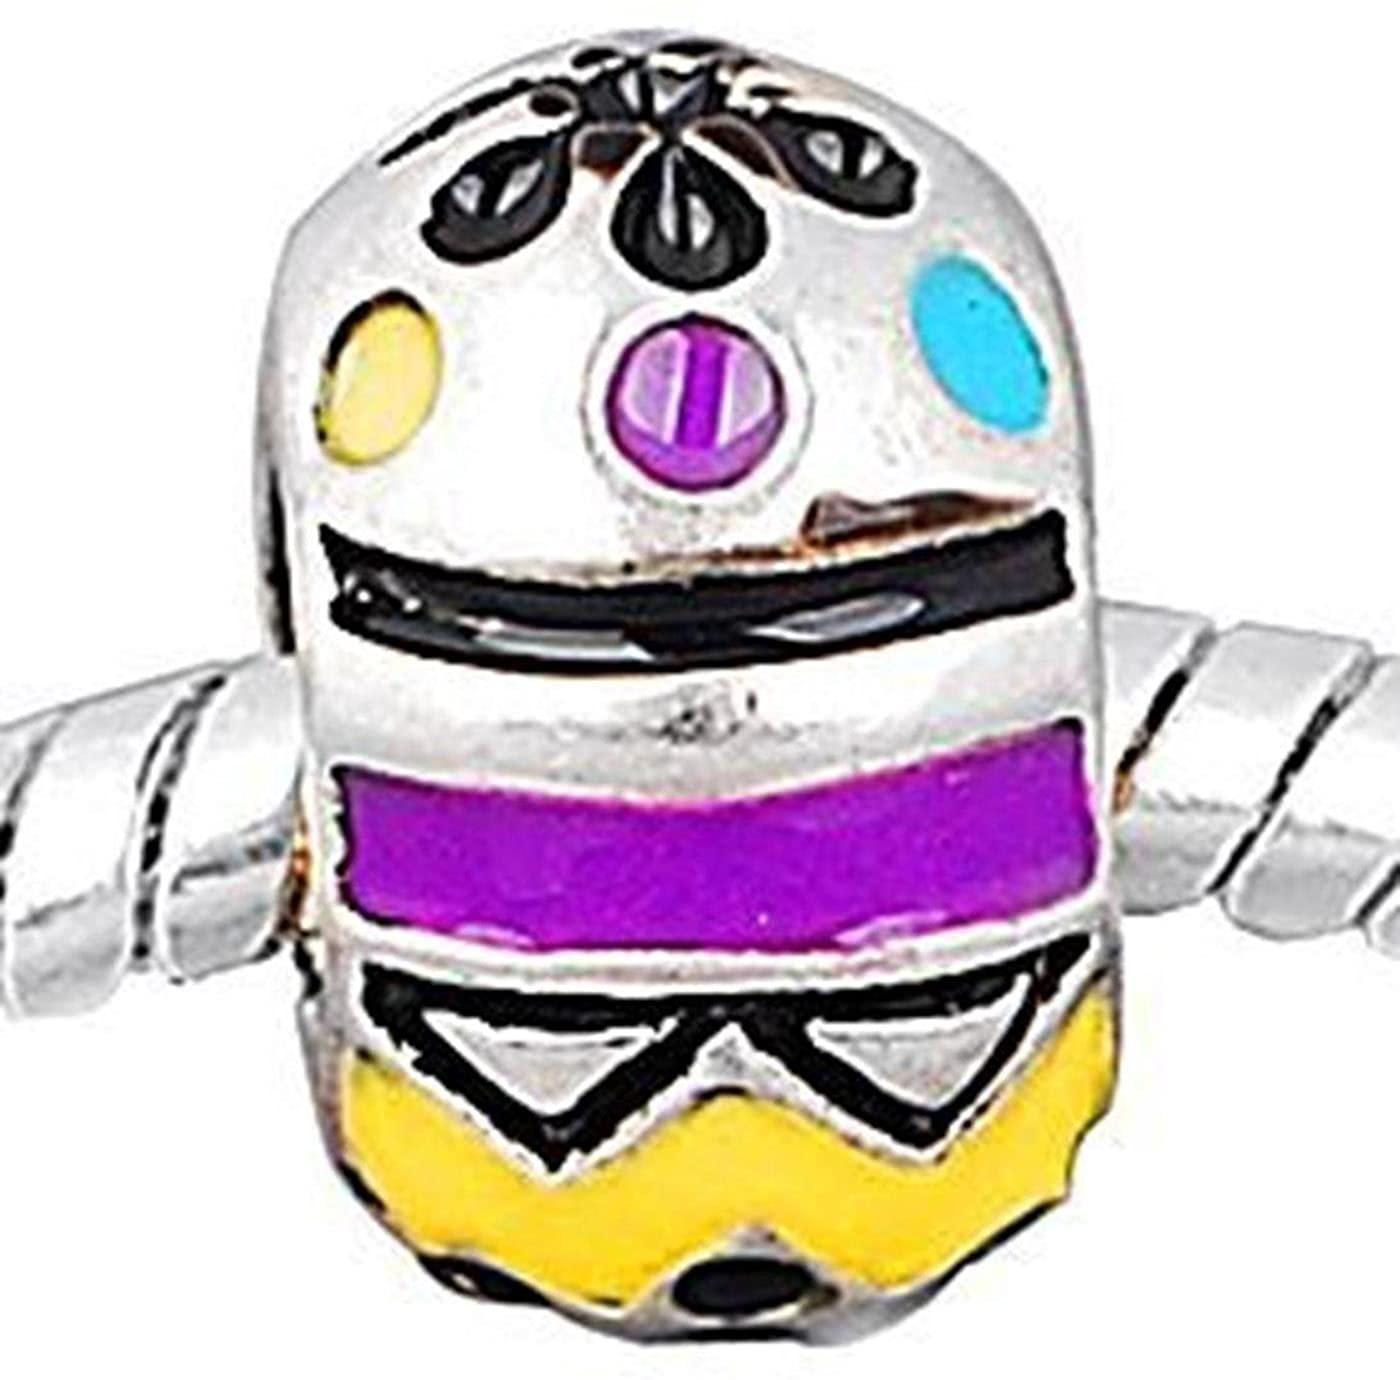 Charm Buddy Easter Egg Jewelry Charm Fits Silver Pandora Style Bracelets